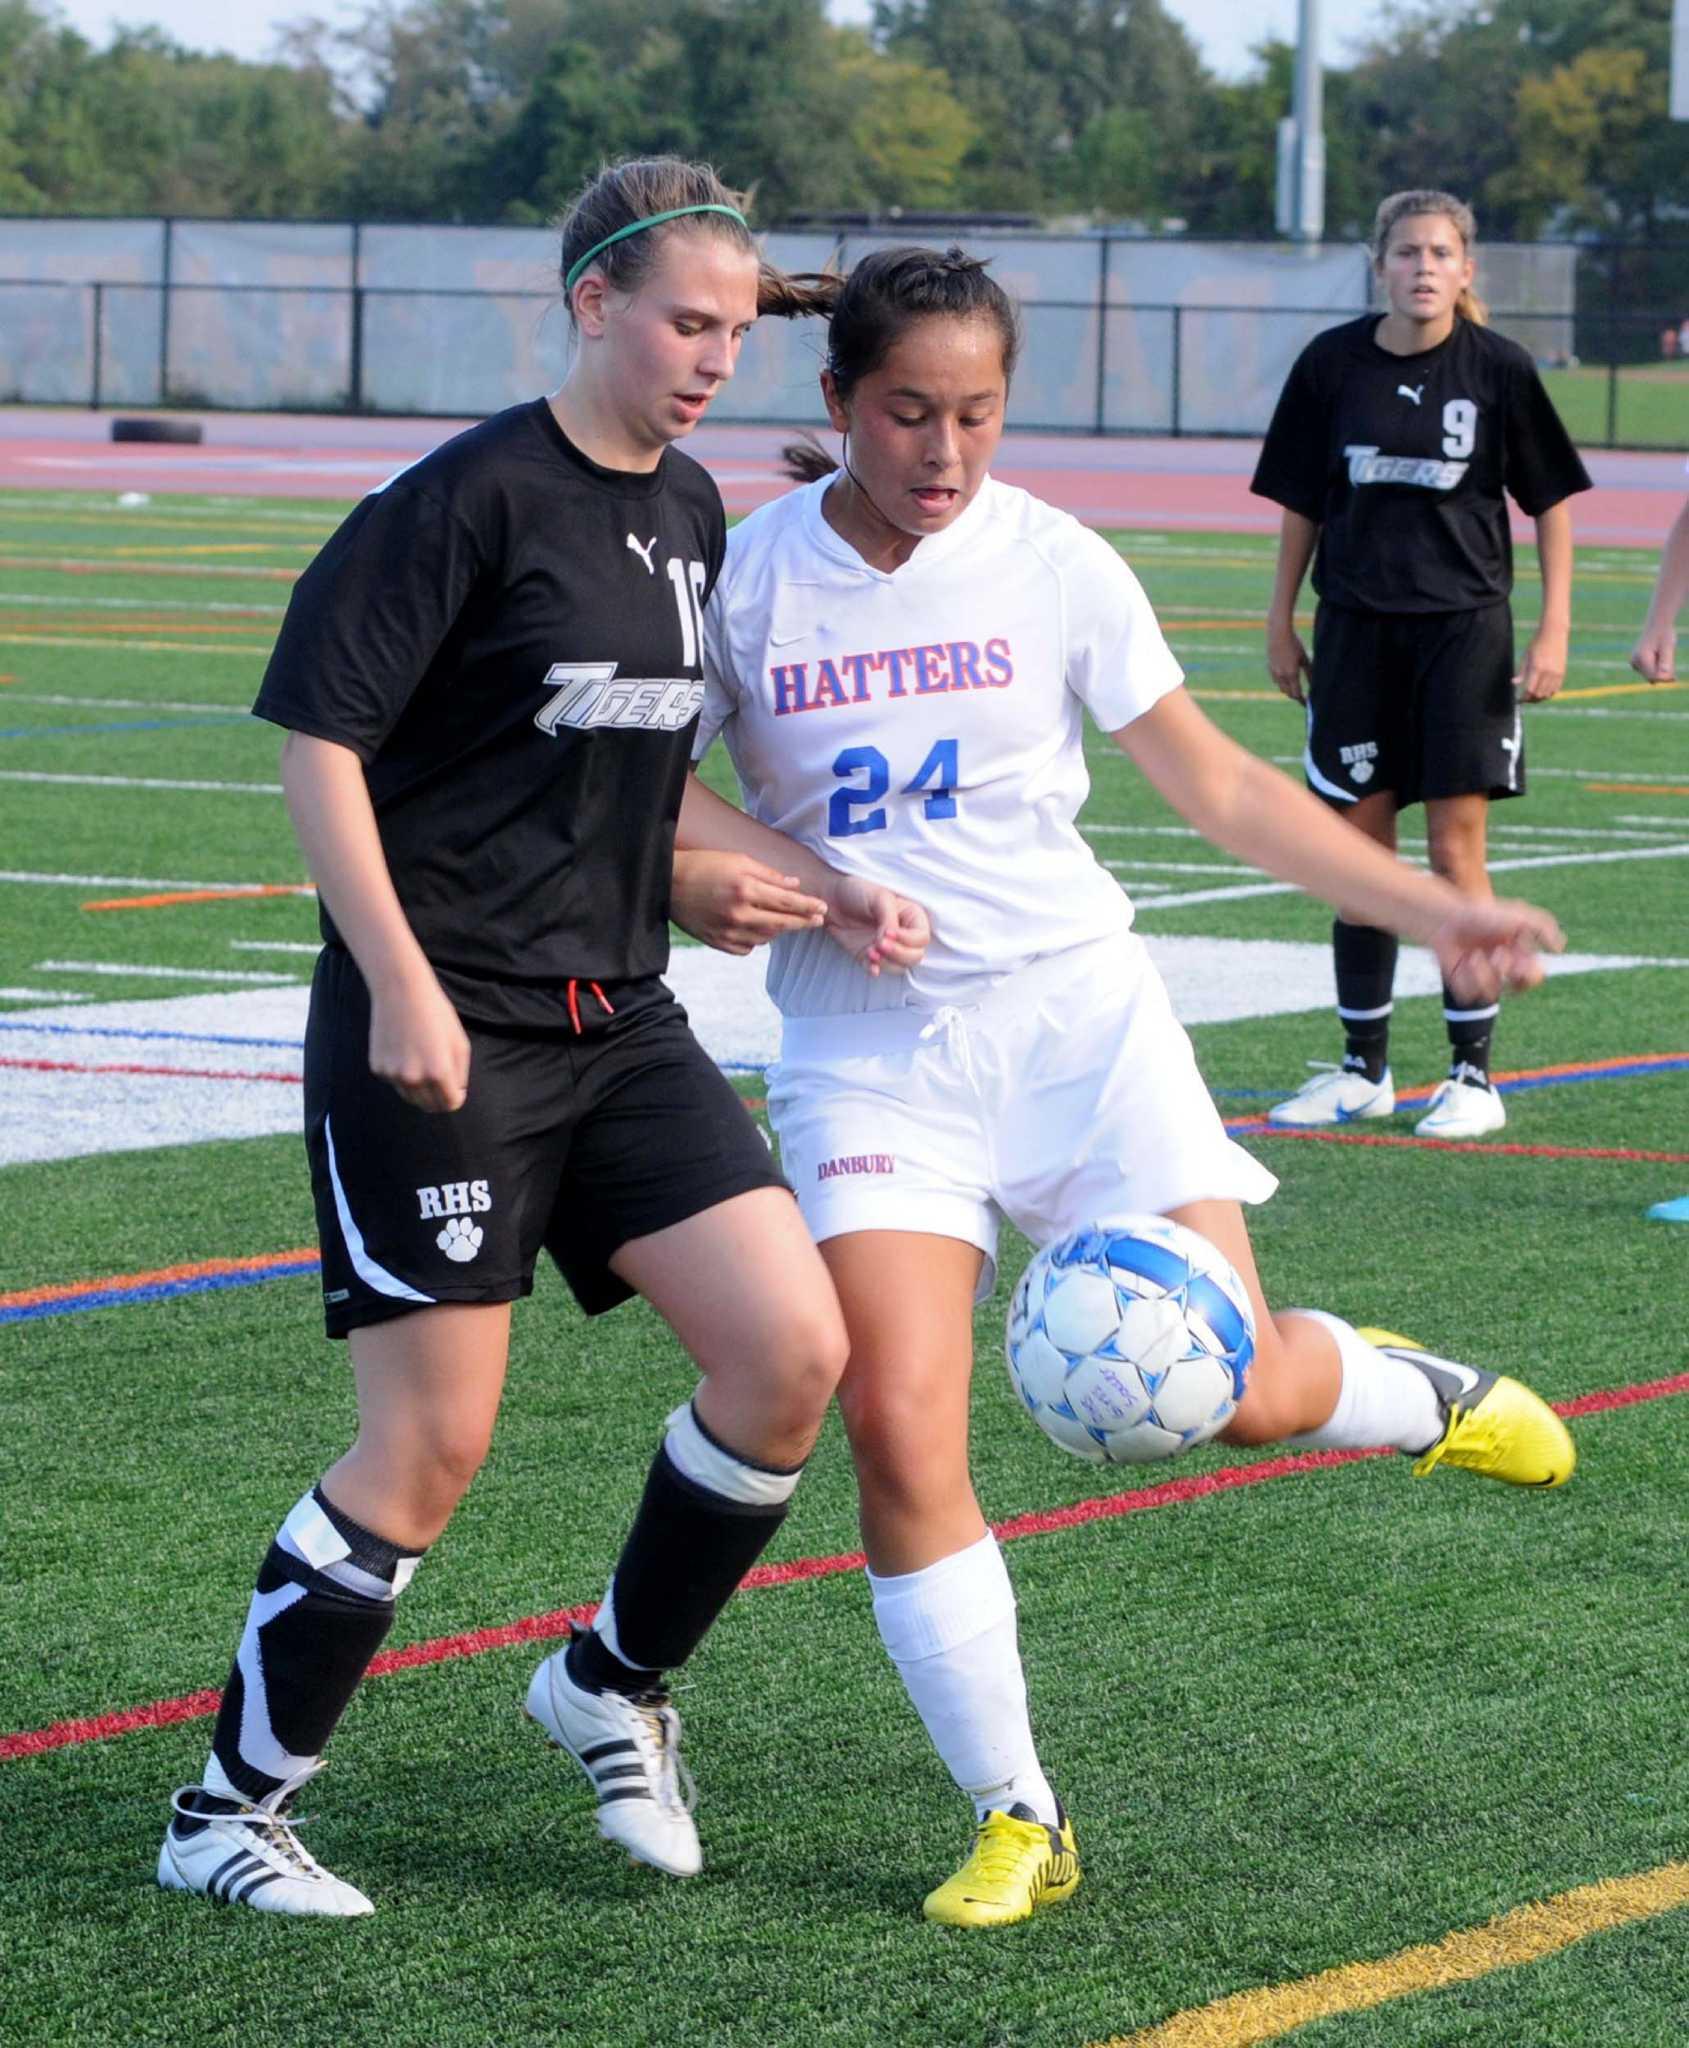 Ridgefield Girls Soccer Team Tops Danbury In Rivalry Clash